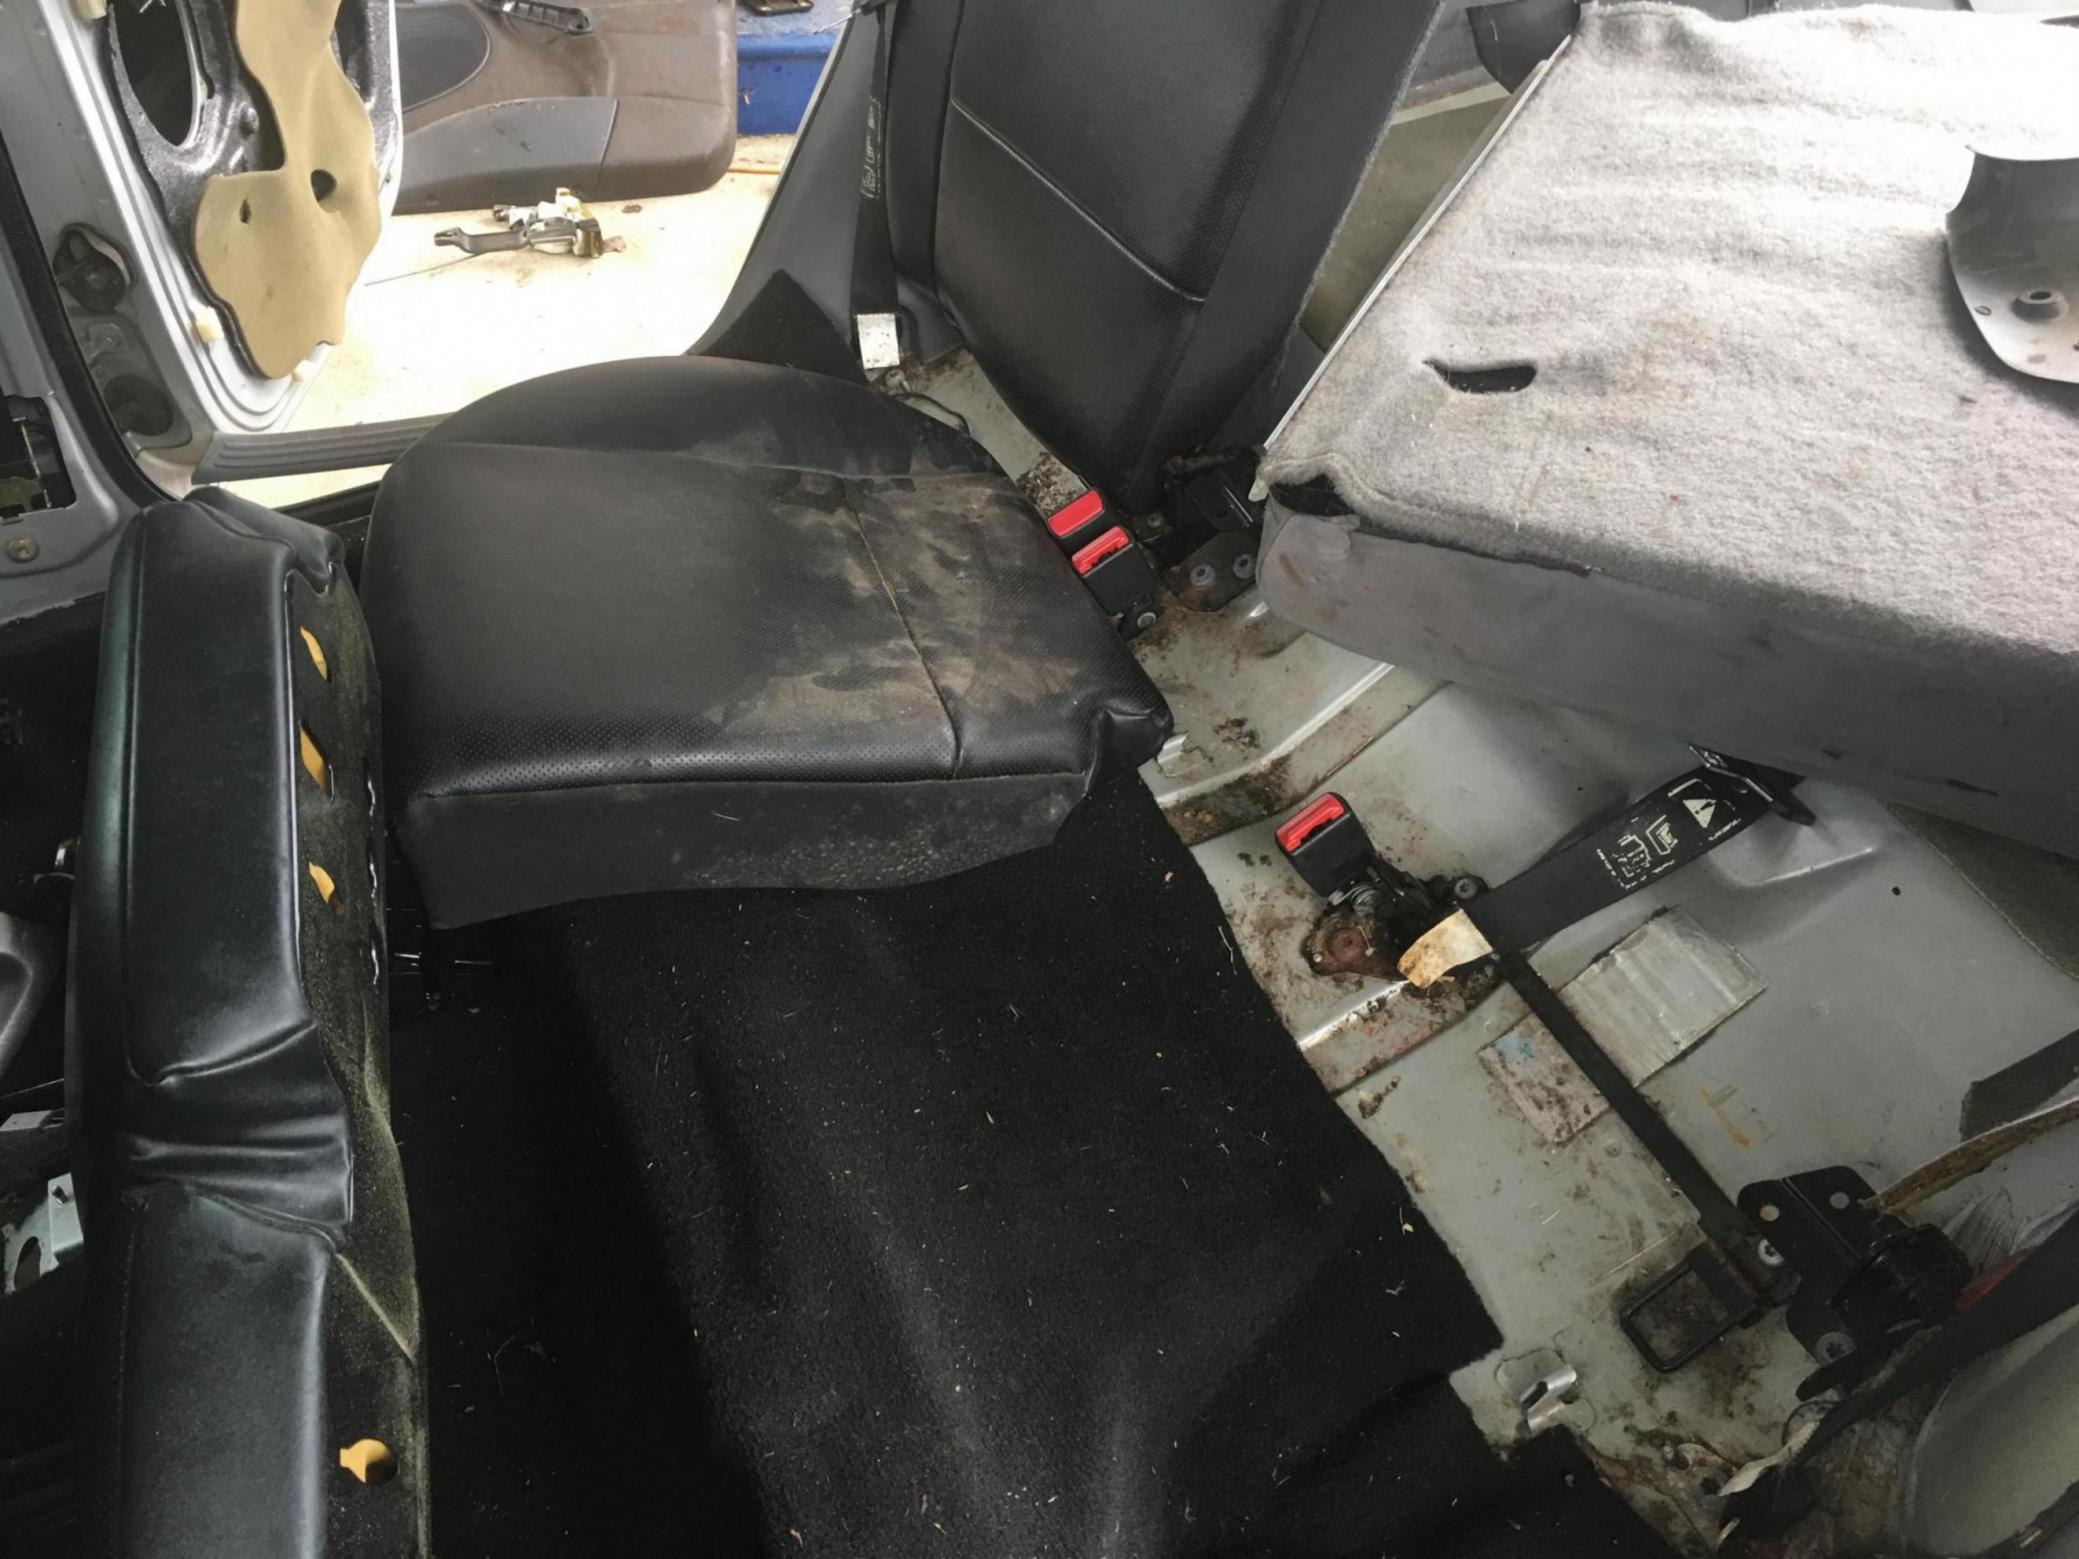 SVT Focus Wagon build-0036a572-7aca-46bb-b175-47f58471cec5_1554753138016.jpg